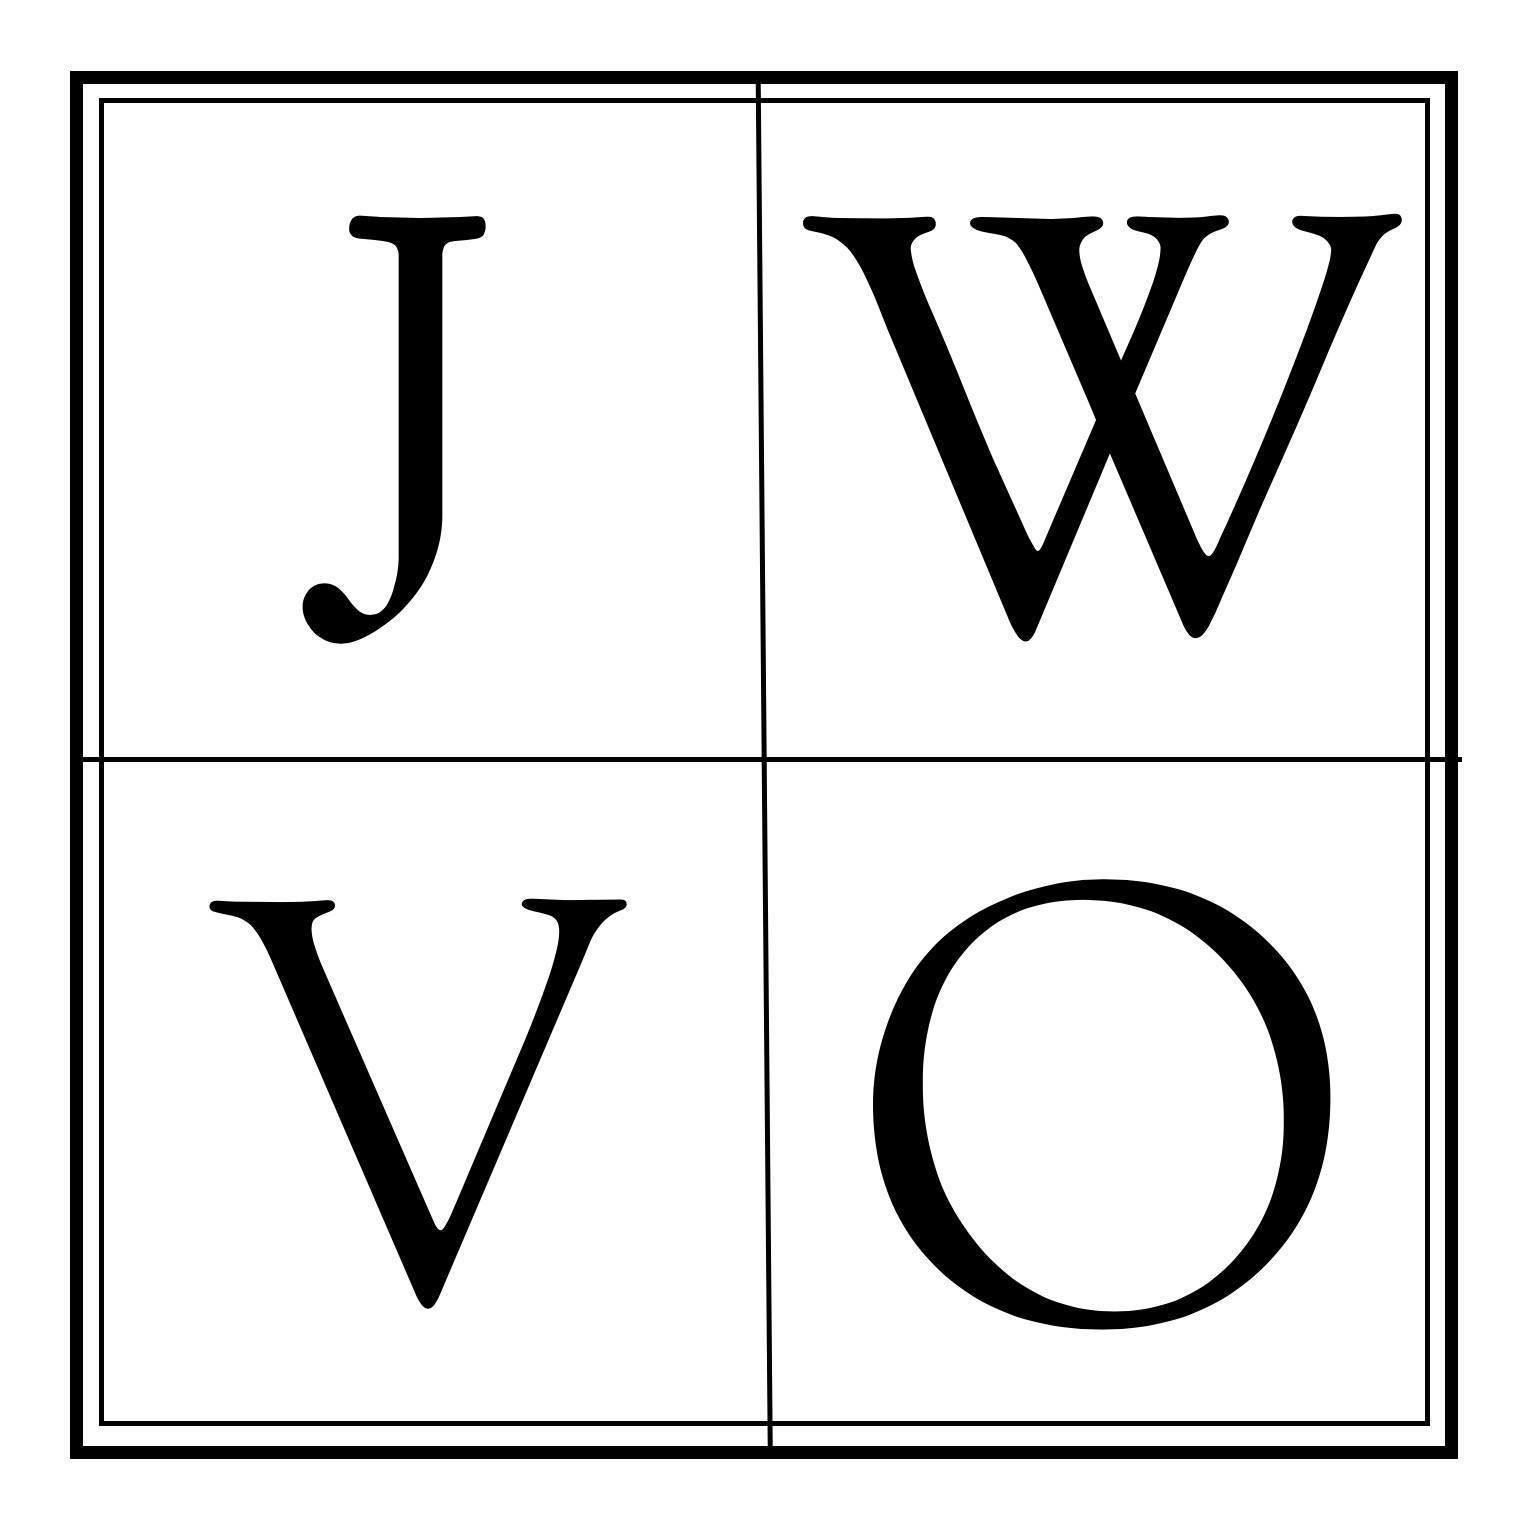 Jeffwilliamsvoice